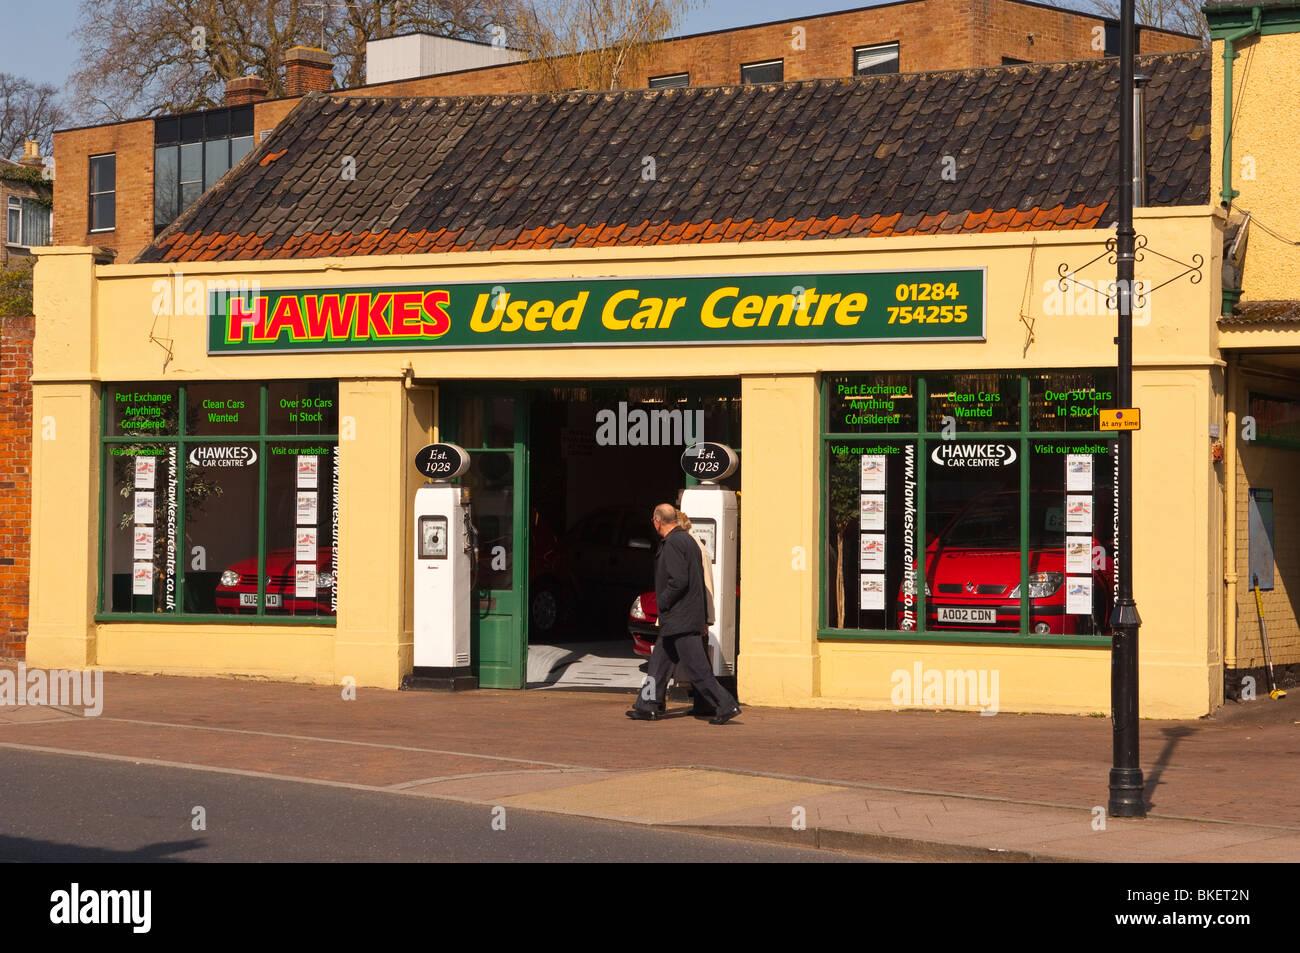 second hand car sales uk stock photos second hand car. Black Bedroom Furniture Sets. Home Design Ideas